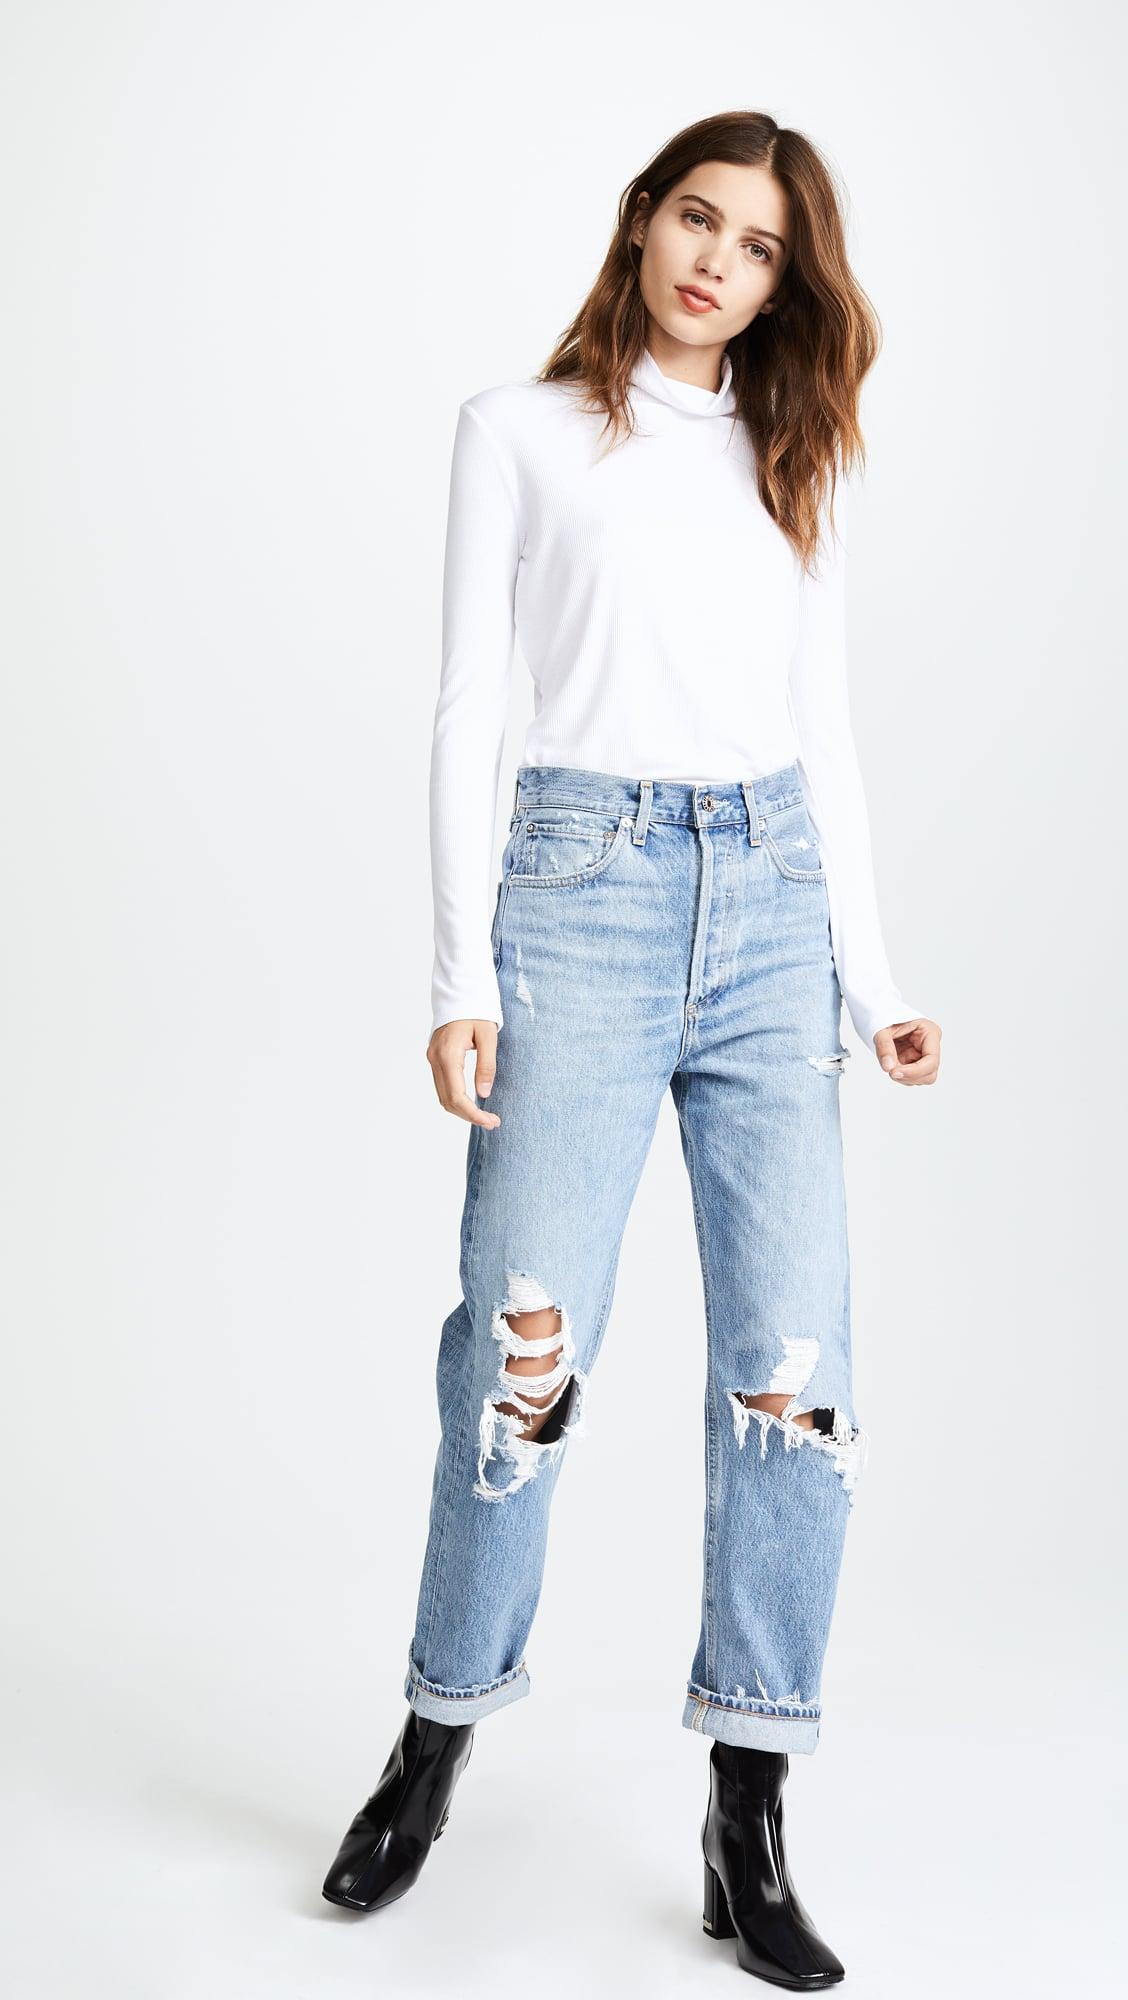 Outfit boyfriend summer jeans Boyfriend Jeans